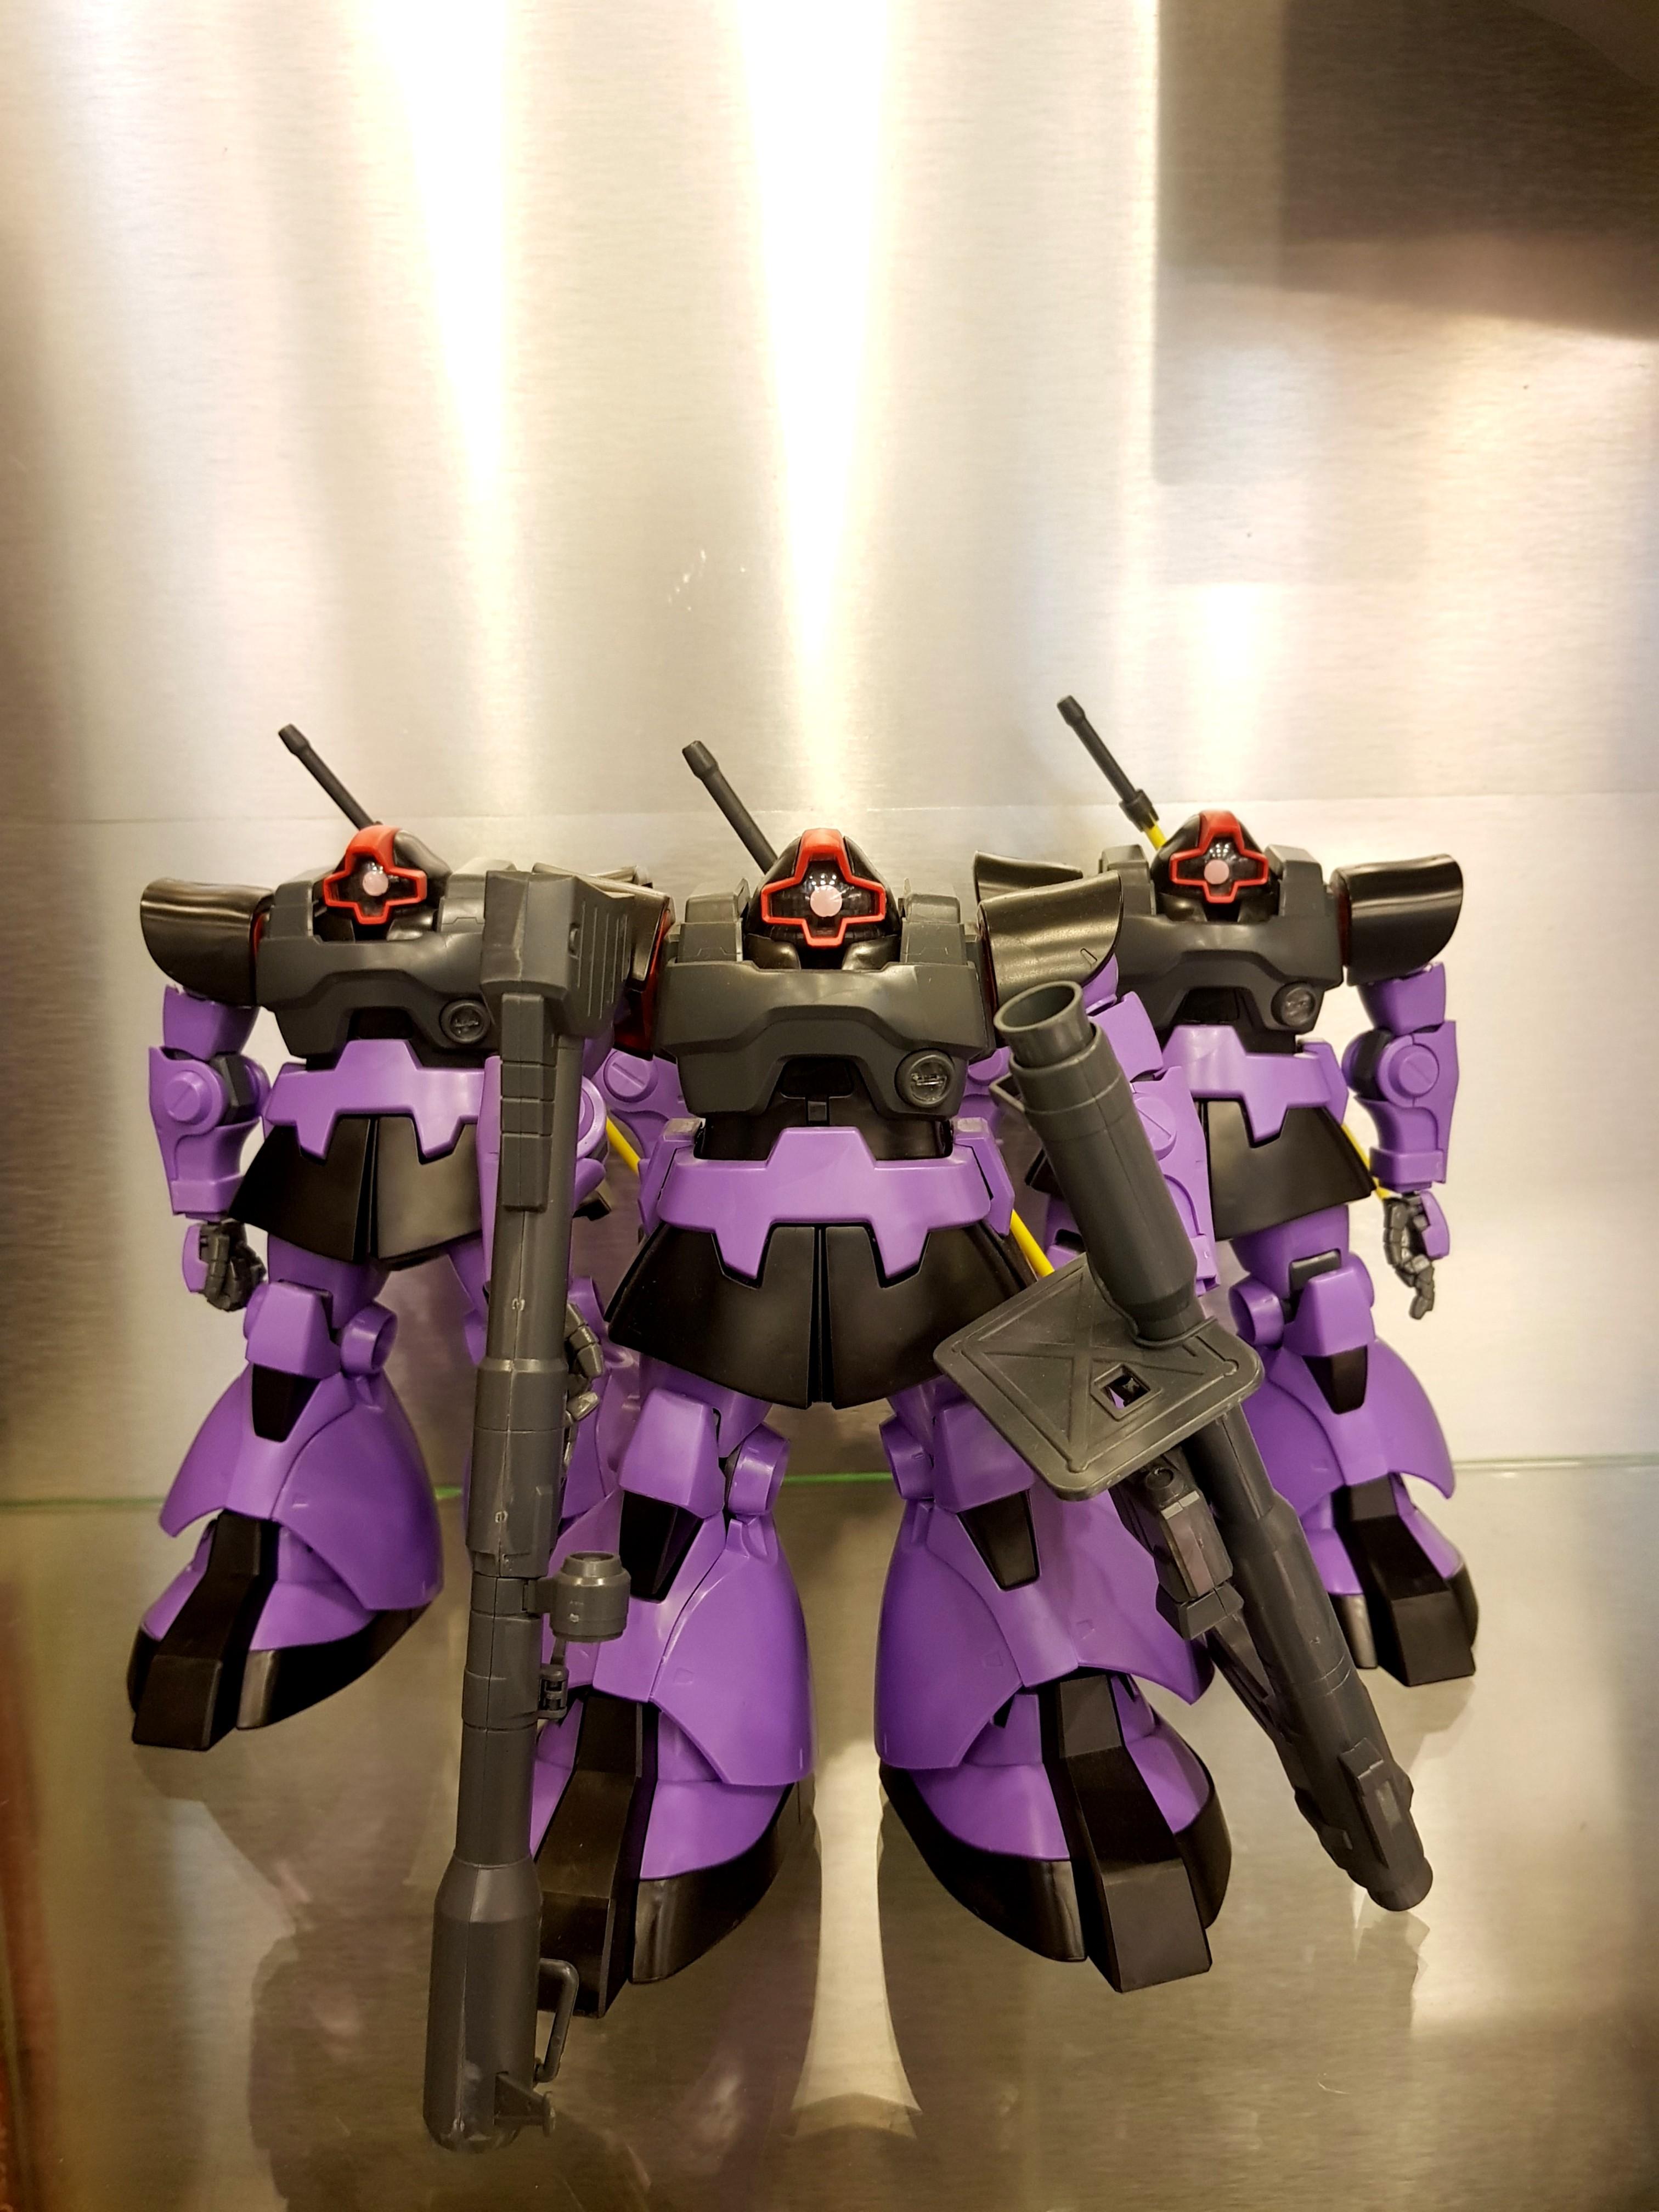 Gundam Mg Dom Reserved Toys Games Bricks Figurines On Bandai 1 144 Hgoo Gnt 0000 00 Qant Qanta Photo